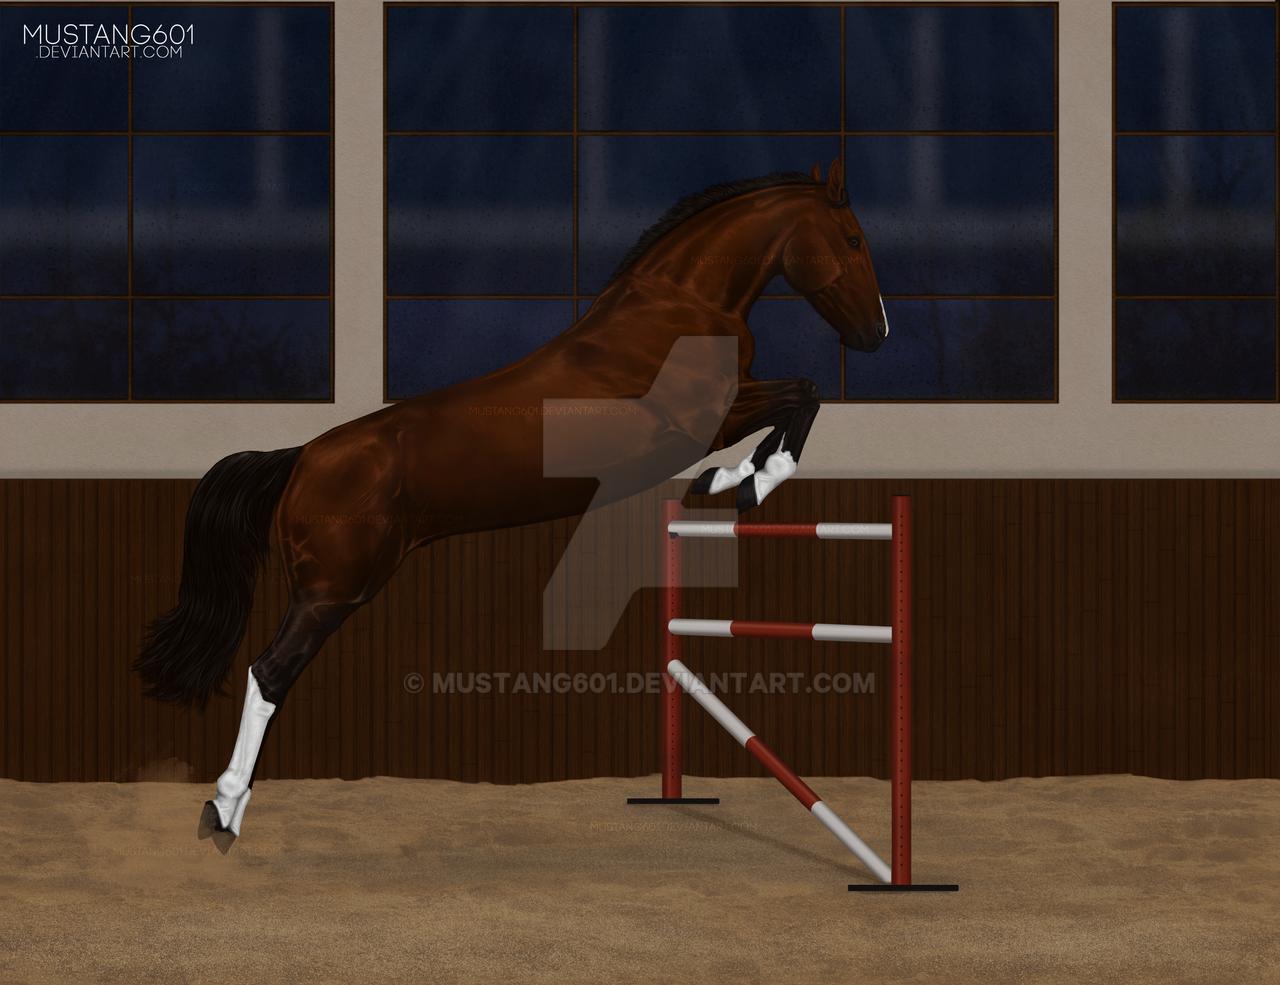 [speedpaint] Loose jumping by Mustang601